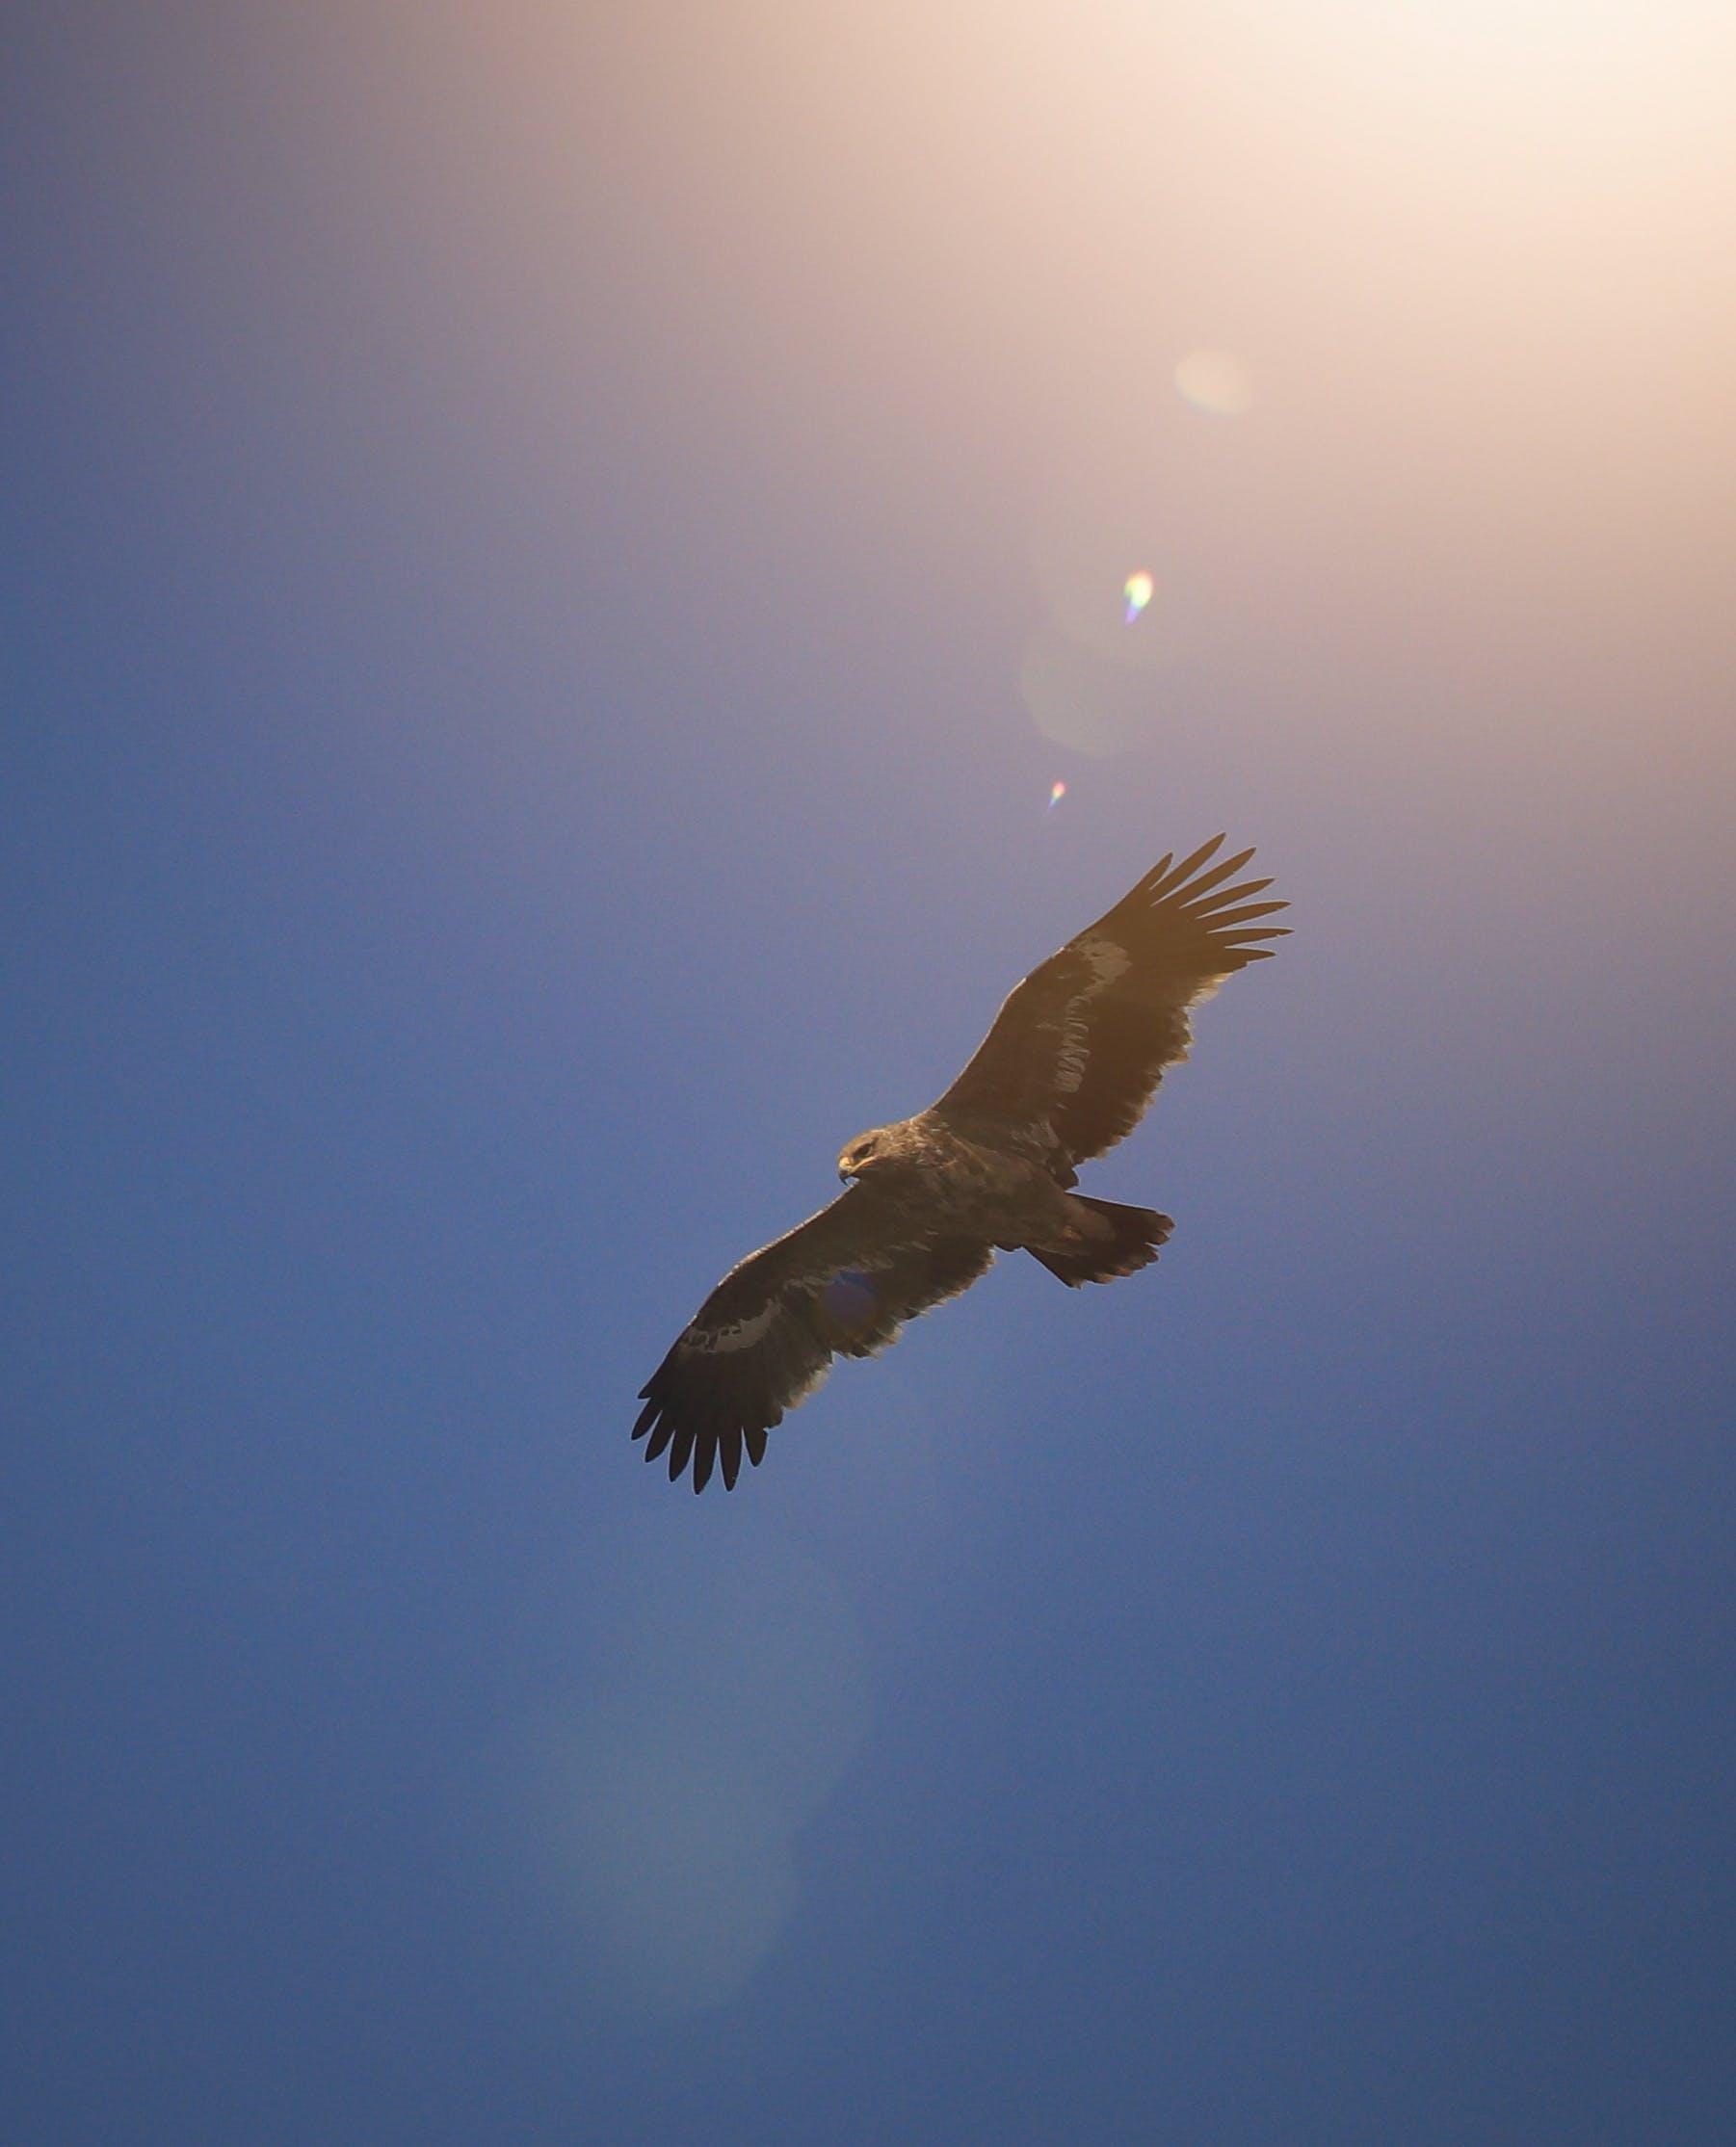 Free stock photo of eagle, nature, sky, wild bird